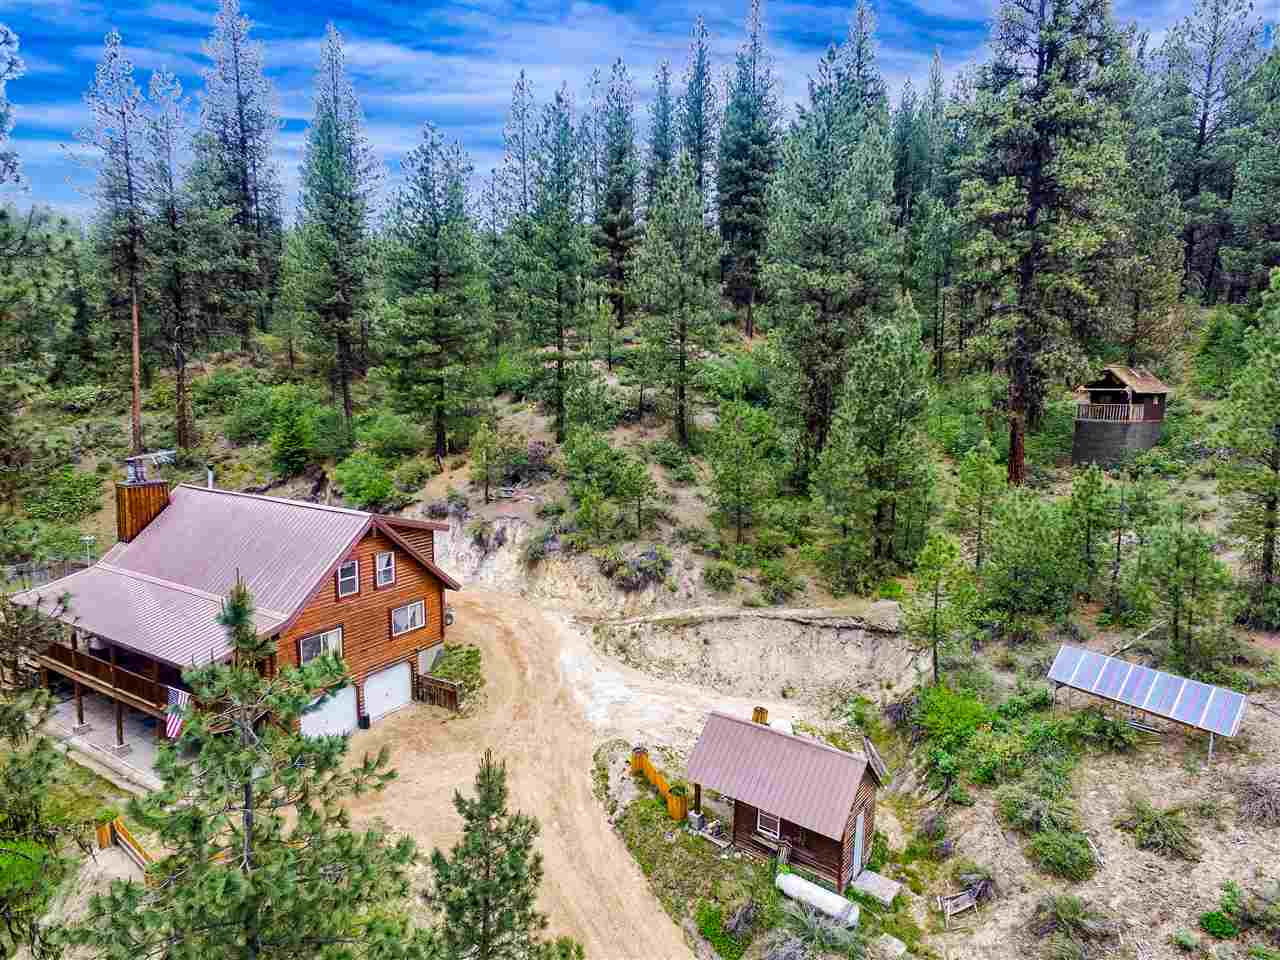 独户住宅 为 销售 在 4 Glen Forest Lane 4 Glen Forest Lane Idaho City, 爱达荷州 83631